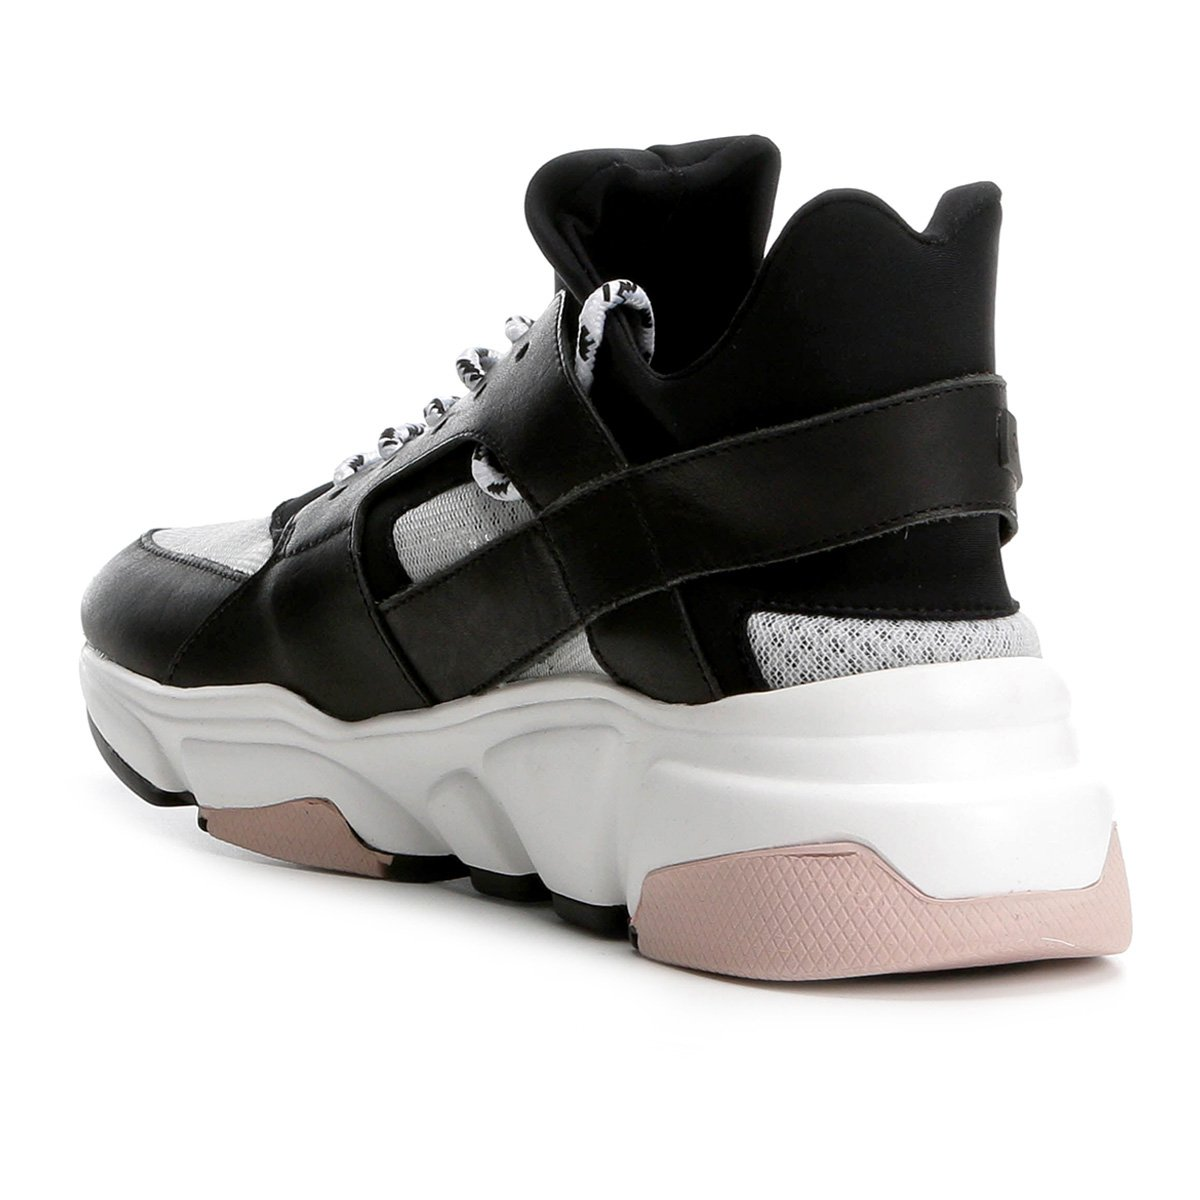 Branco Feminino Preto e Chunky Carrano Tênis Tênis Sneaker Feminino Sneaker Couro Preto Chunky Couro Carrano APqw6